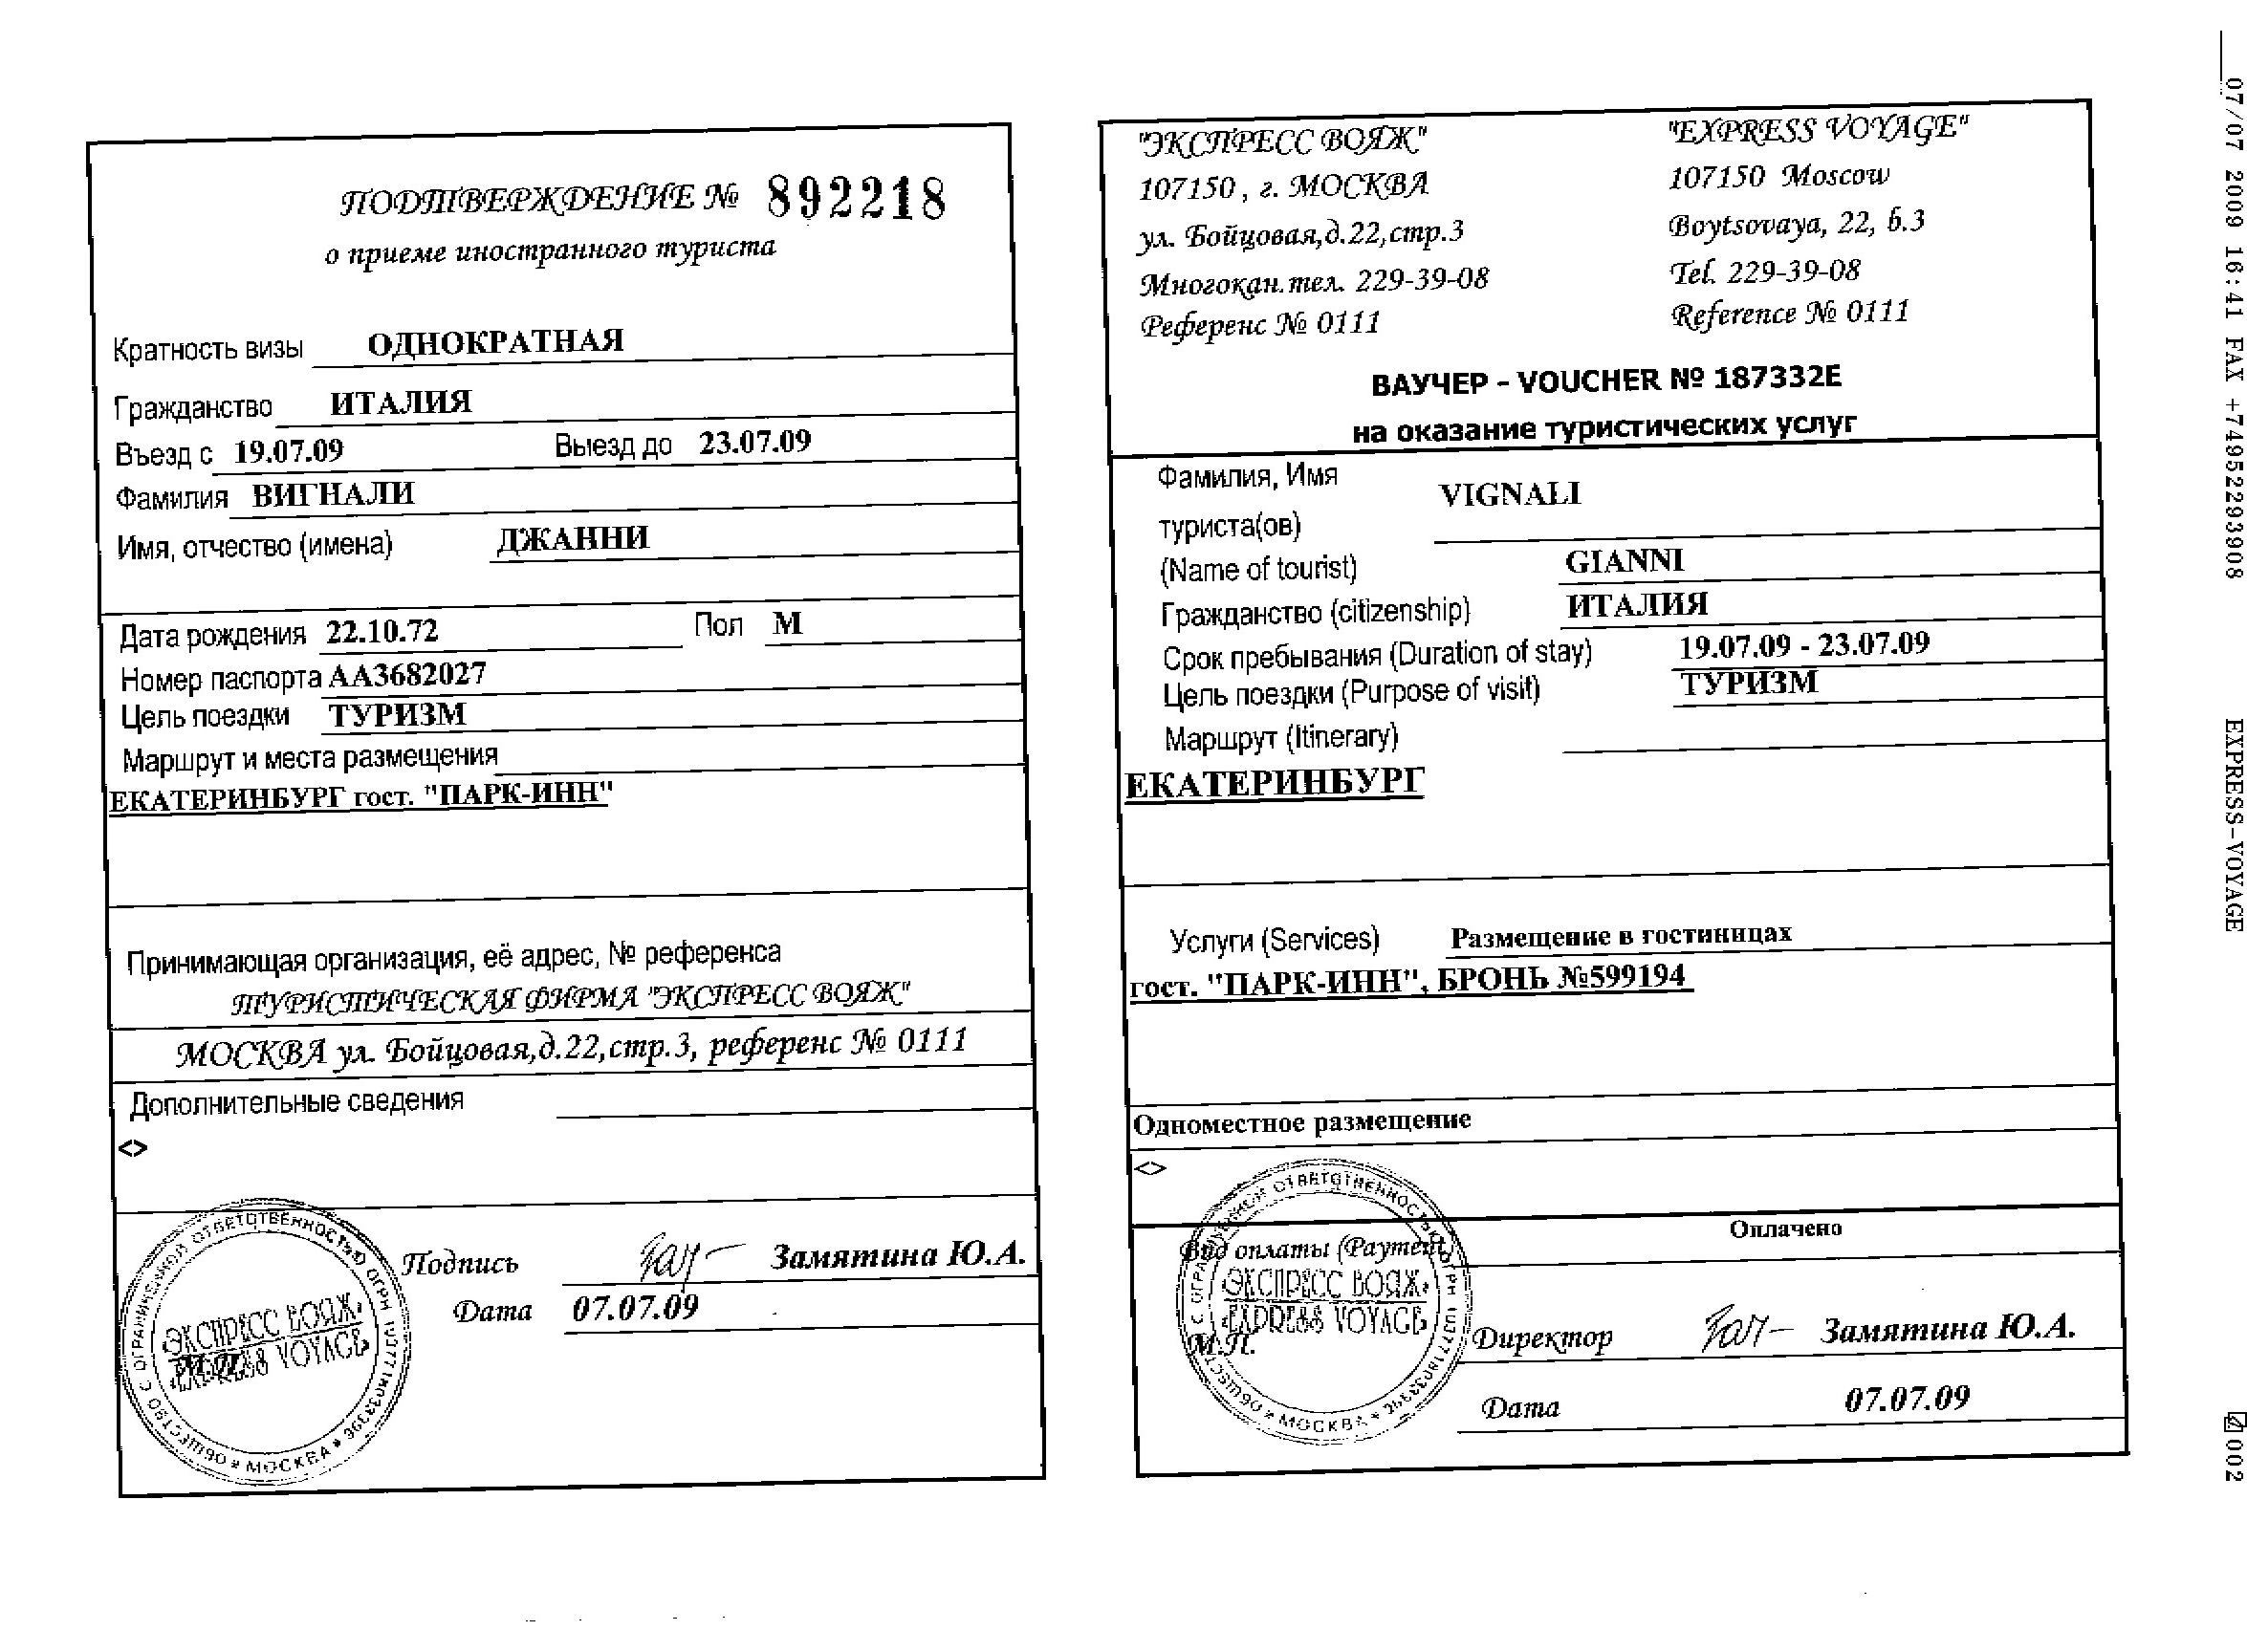 russian visa support invitation letter